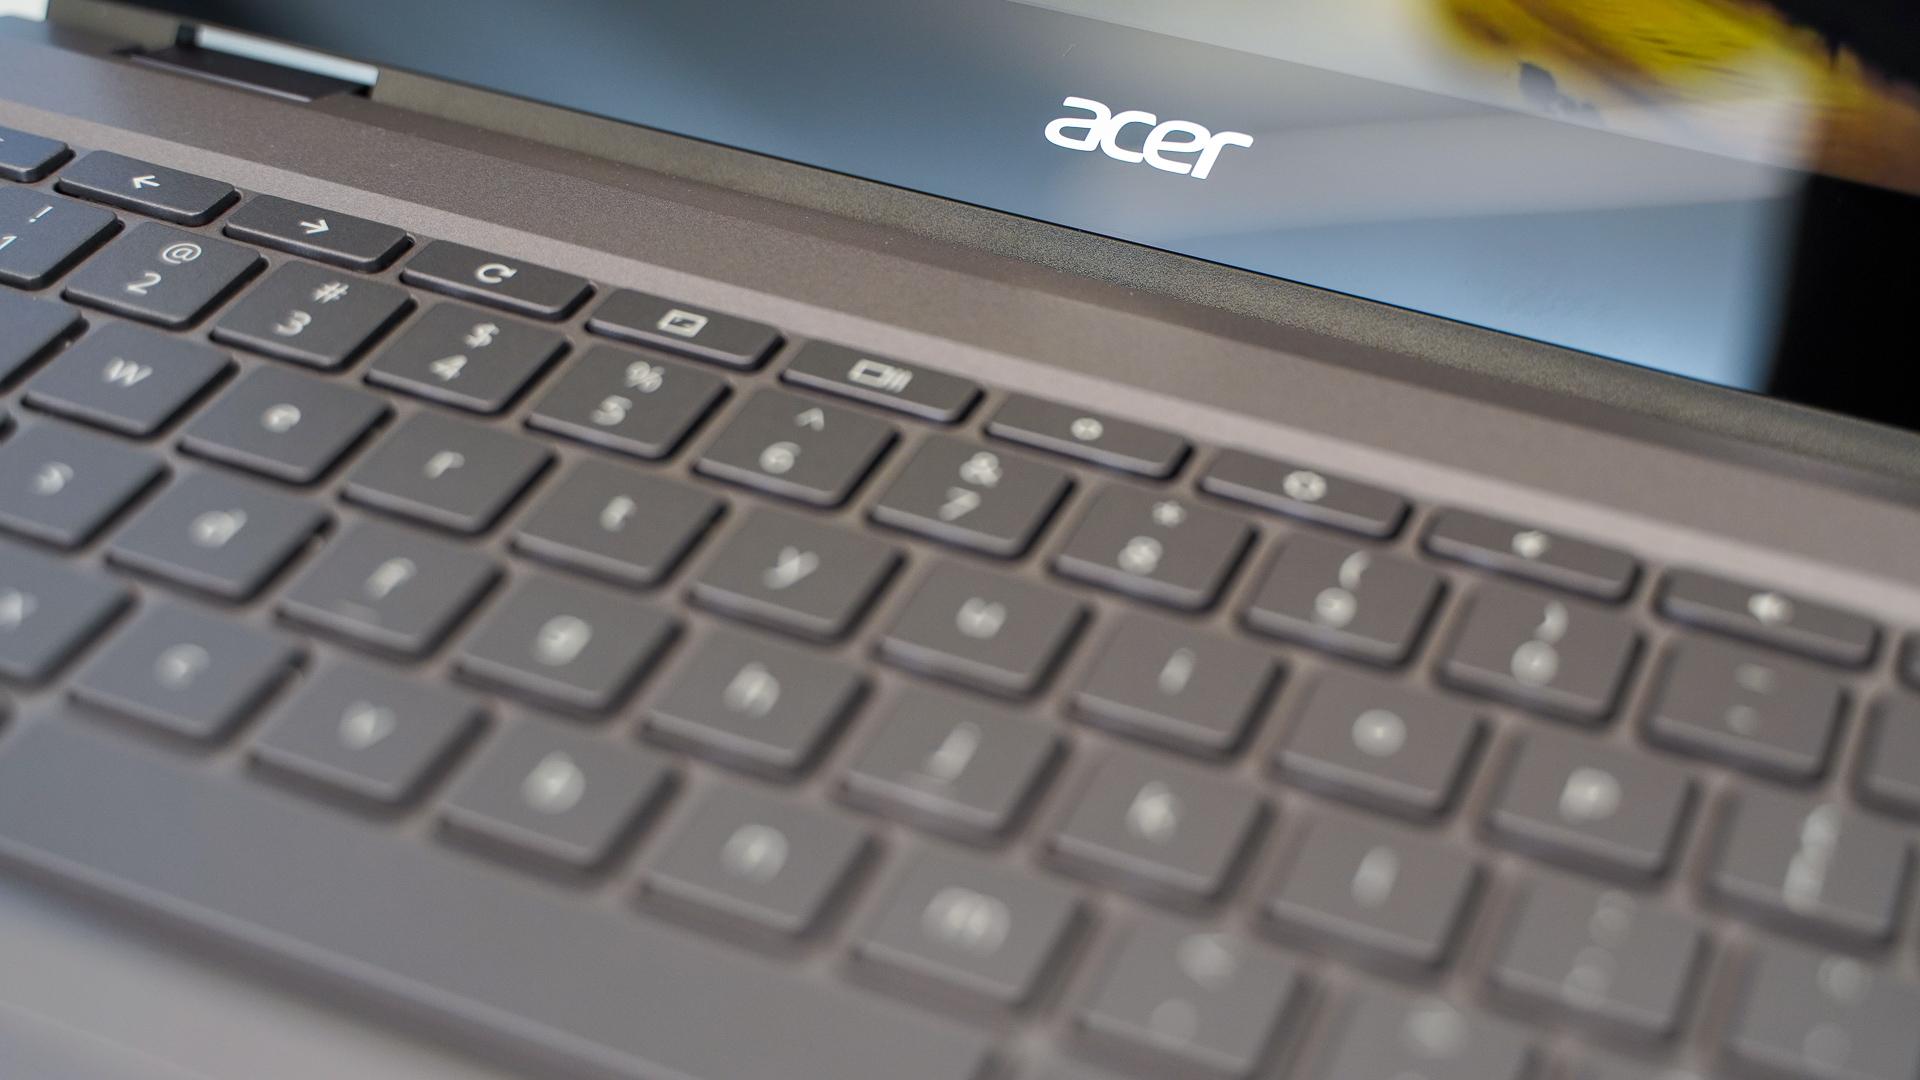 Acer Chromebook Spin 713 keyboard closeup